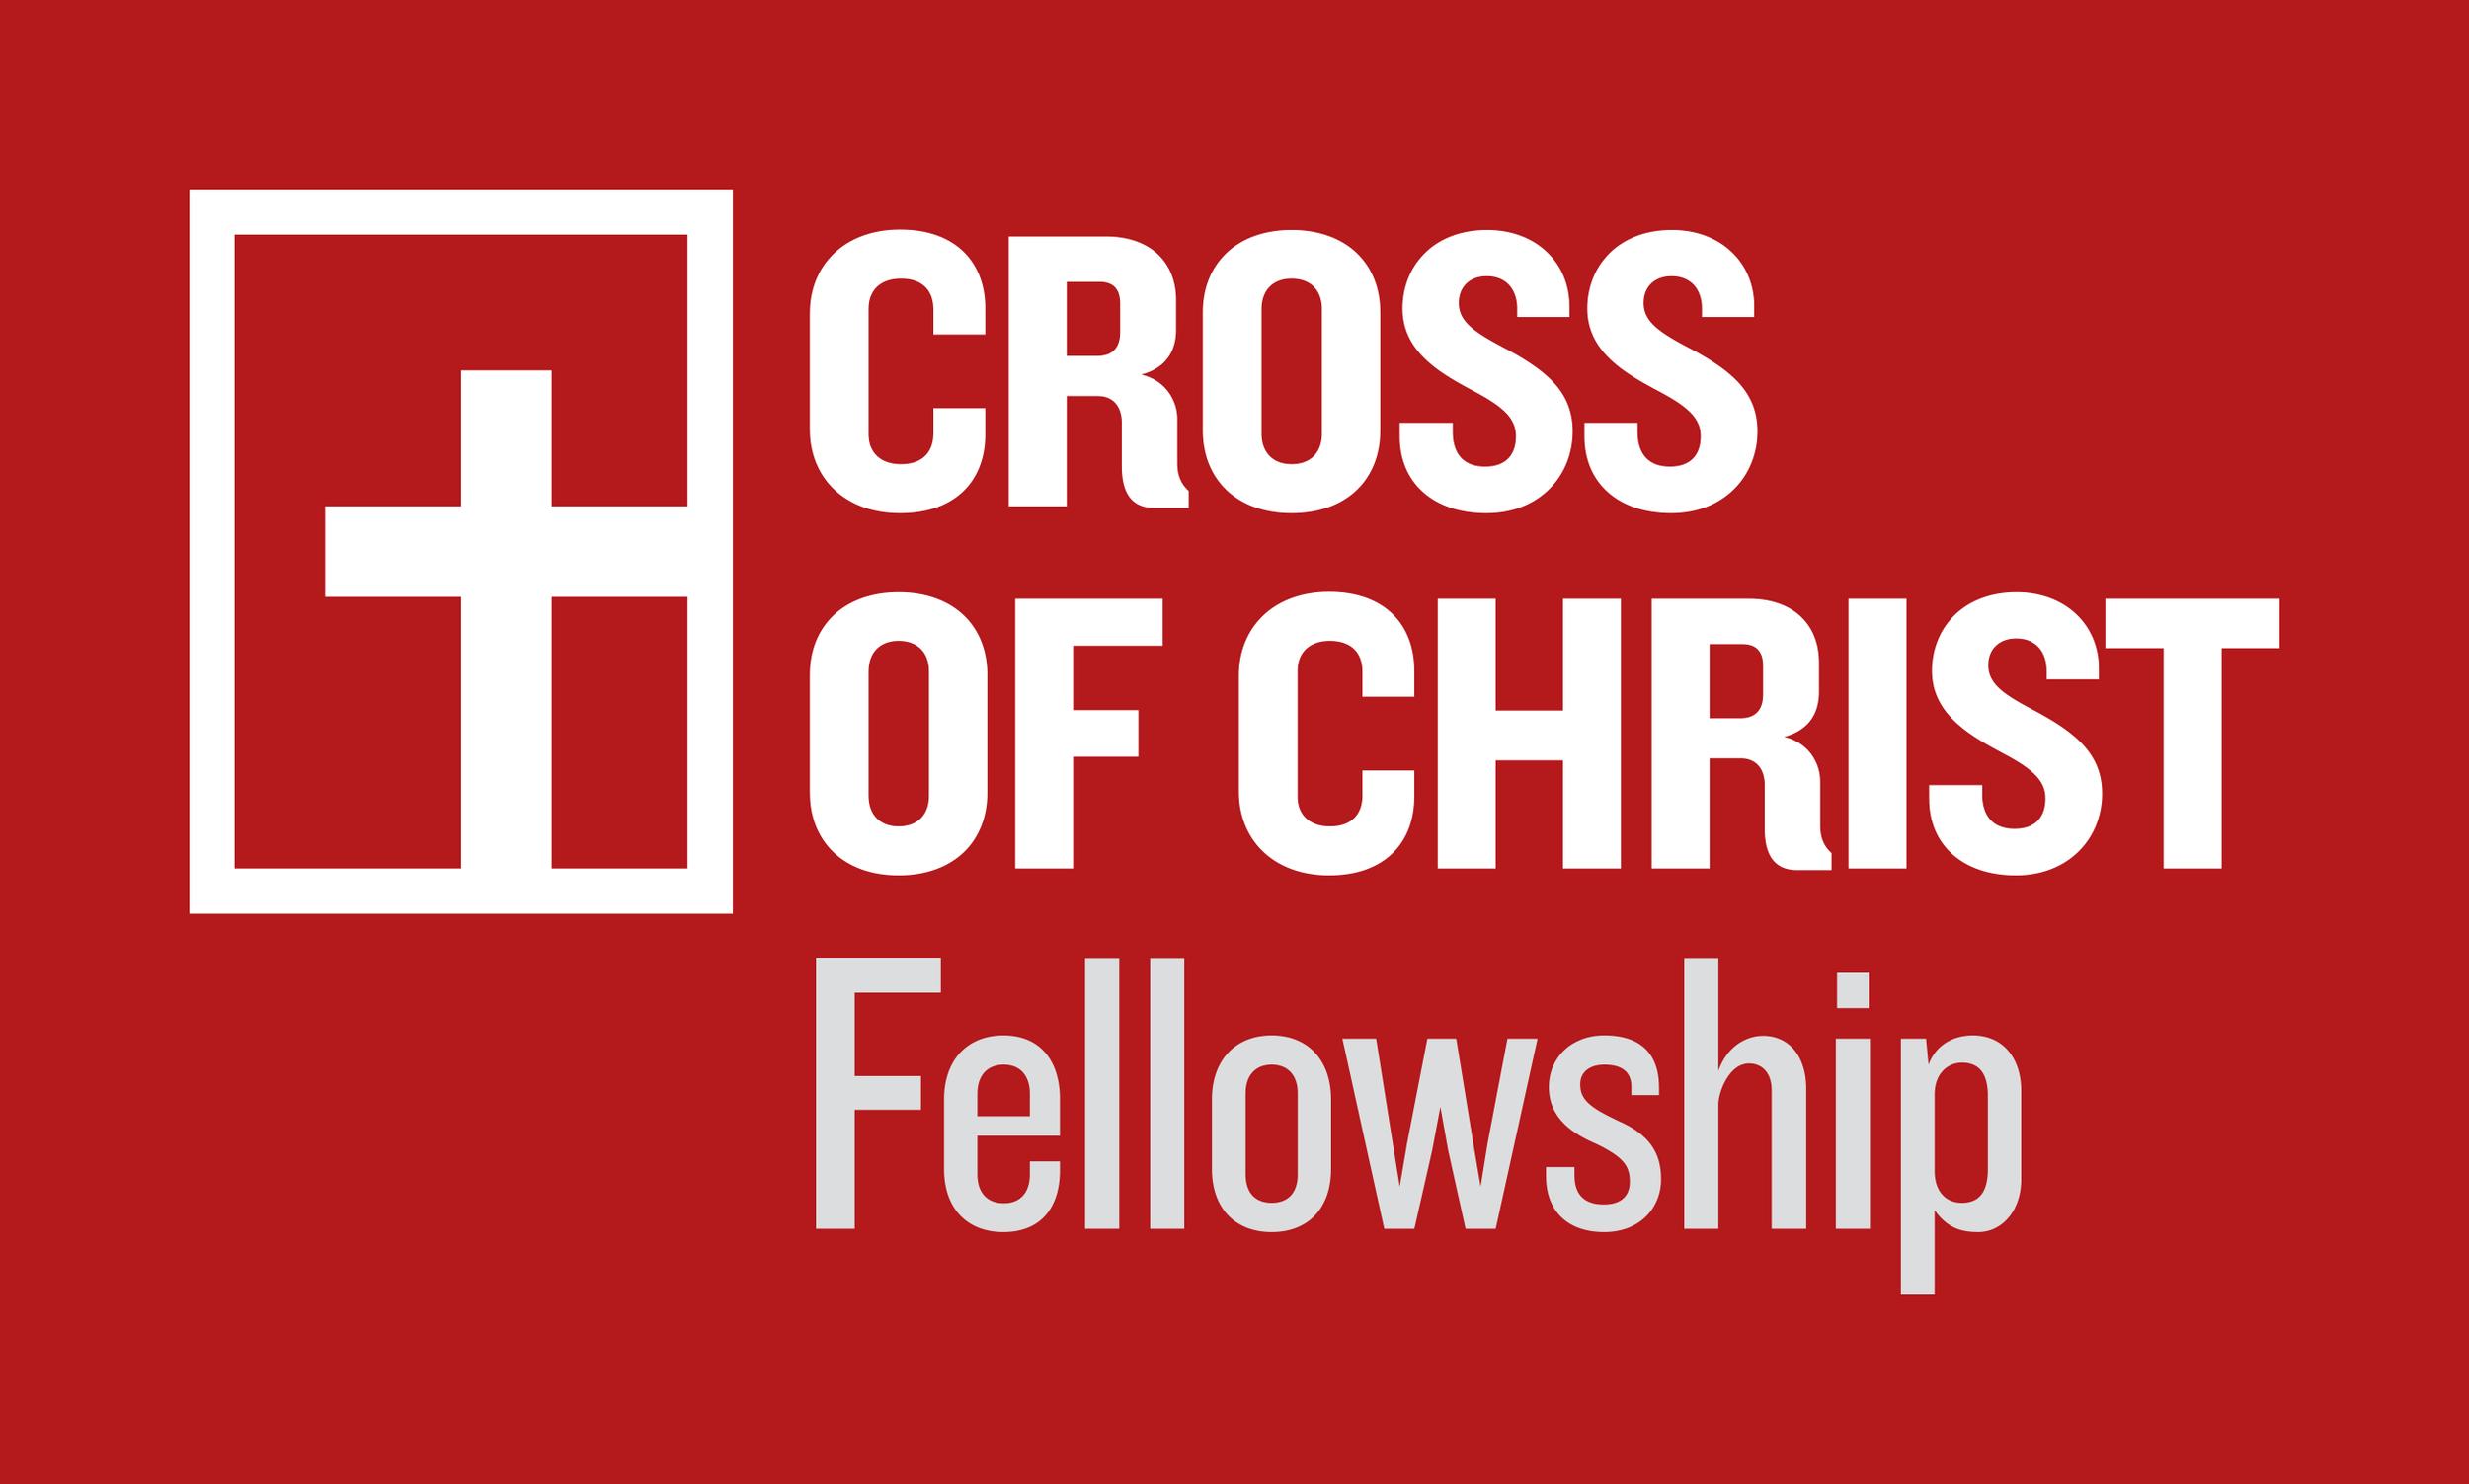 Cross of Christ Fellowship - Image:  https://crossofchristfellowship.org